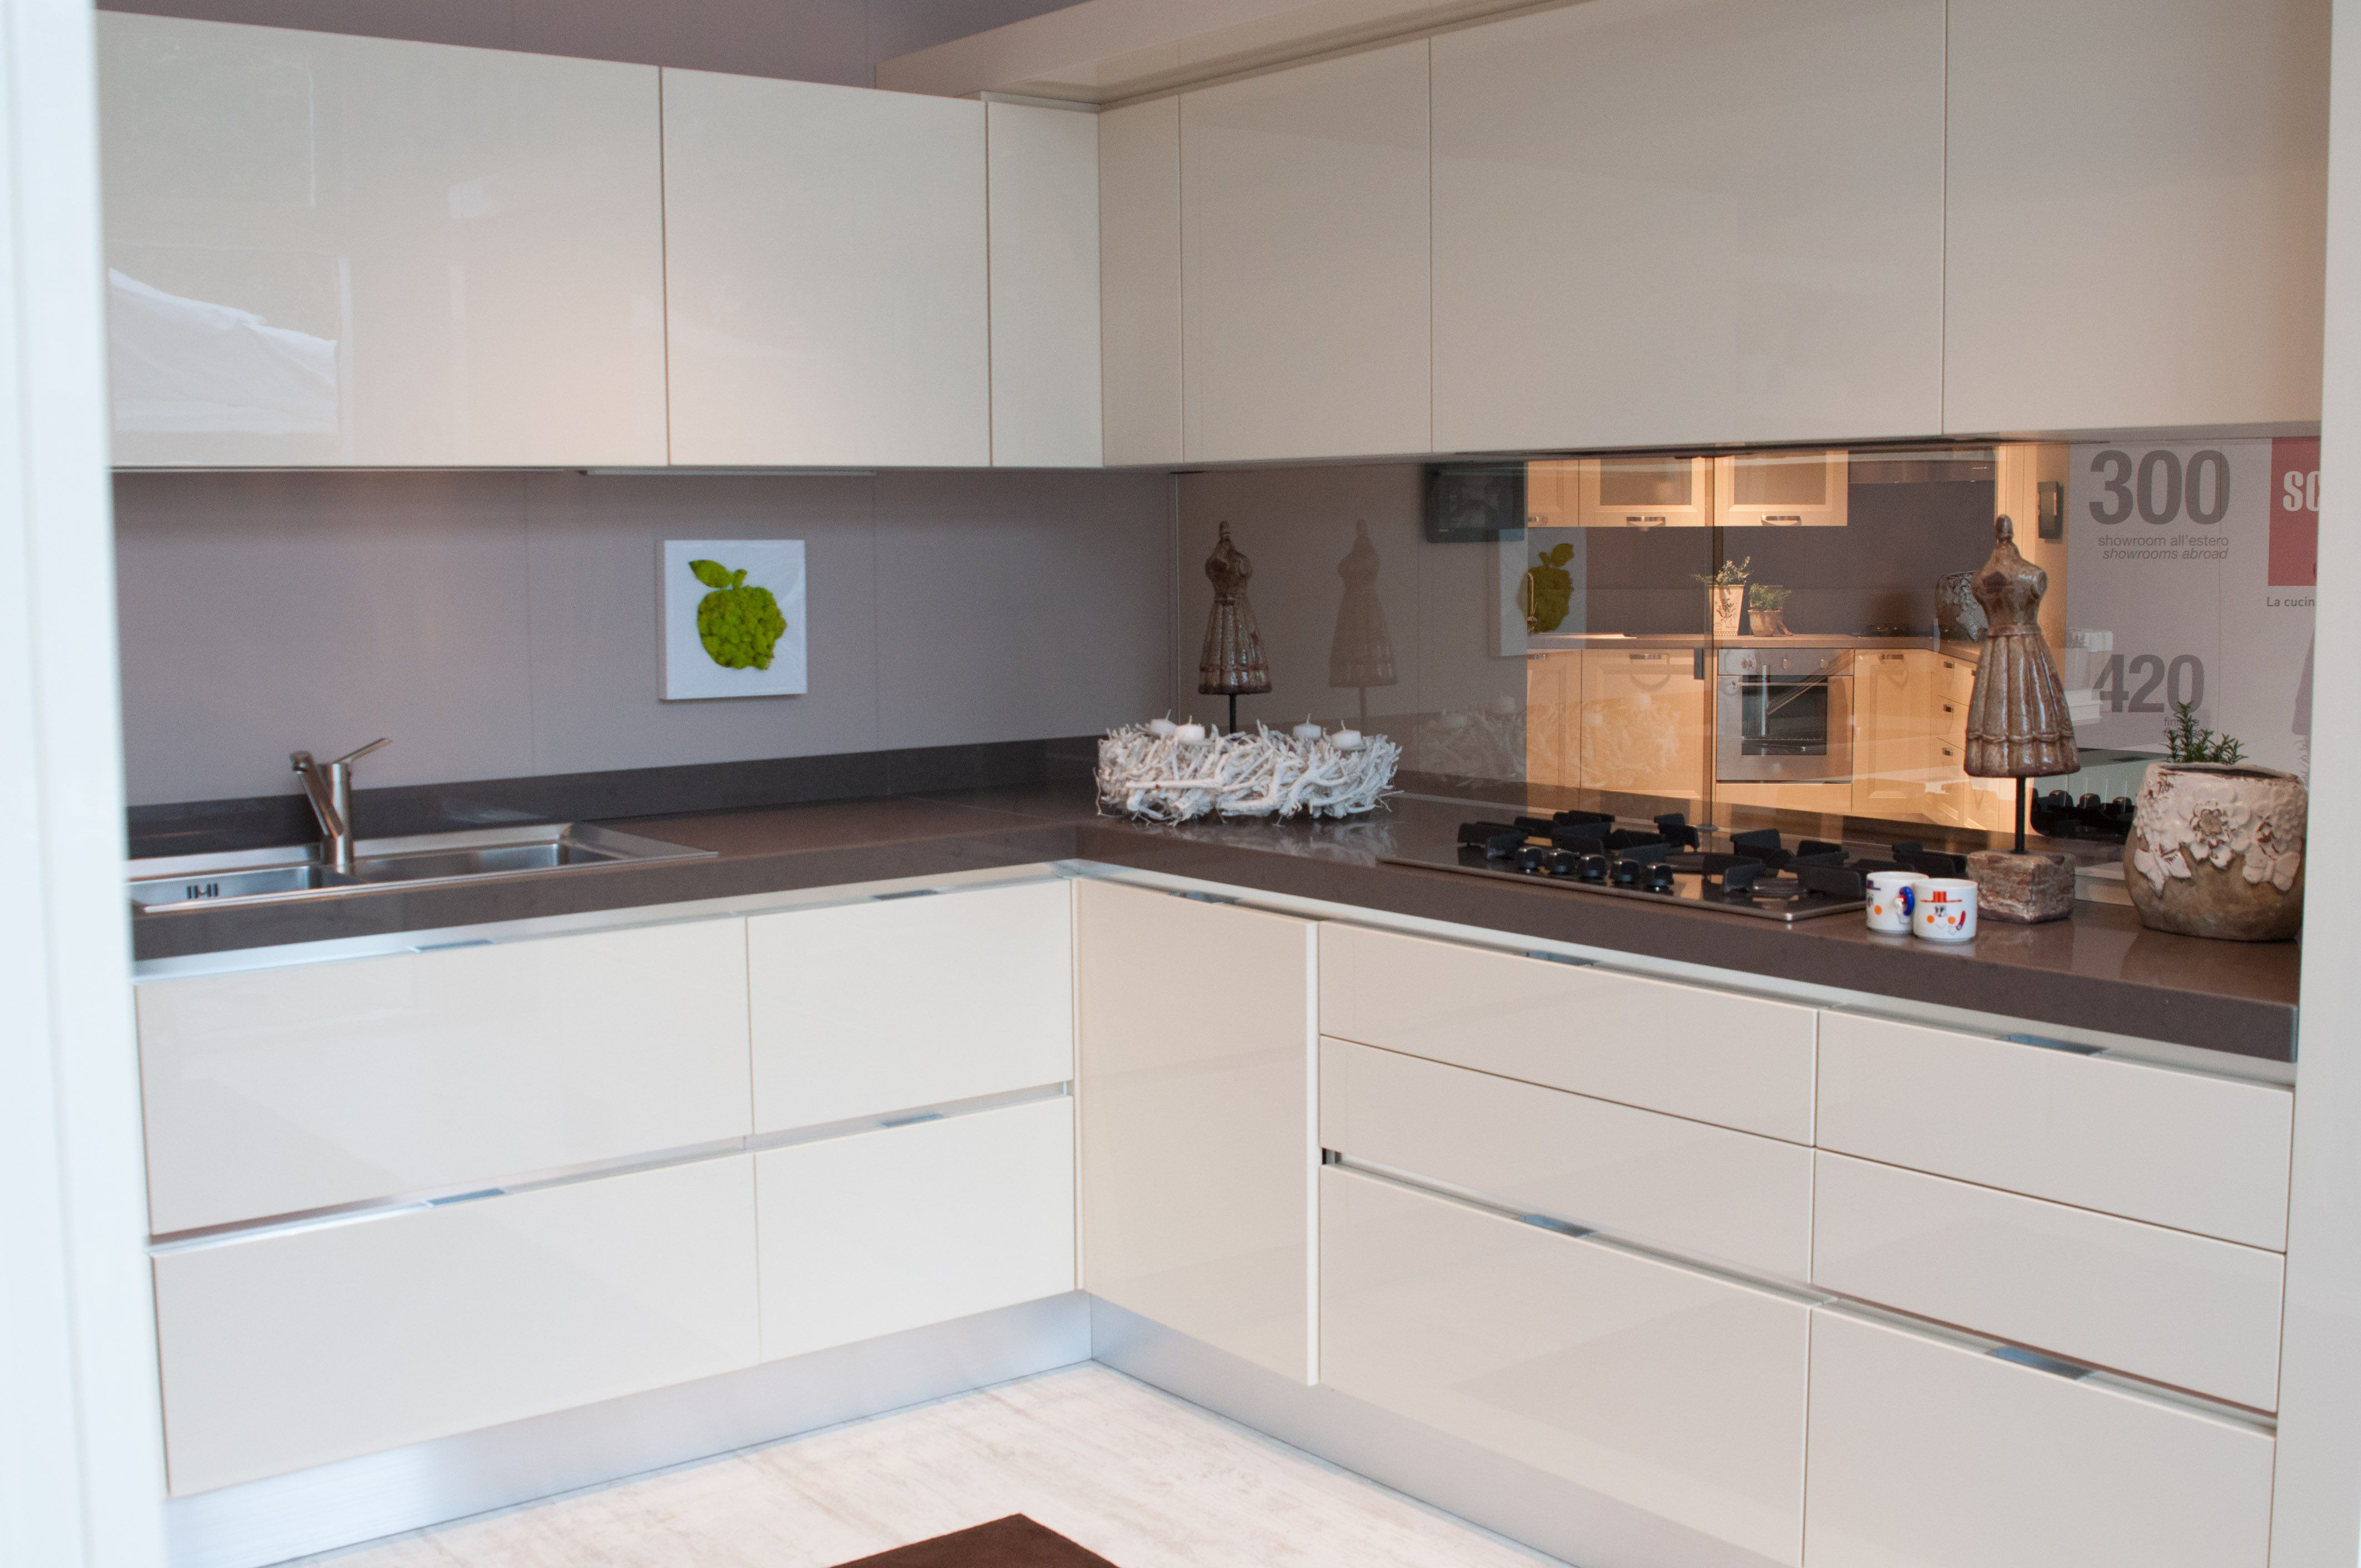 Cucina moderna scavolini composizione ad angolo bianca home pinterest apartment ideas - Cucina moderna design ...